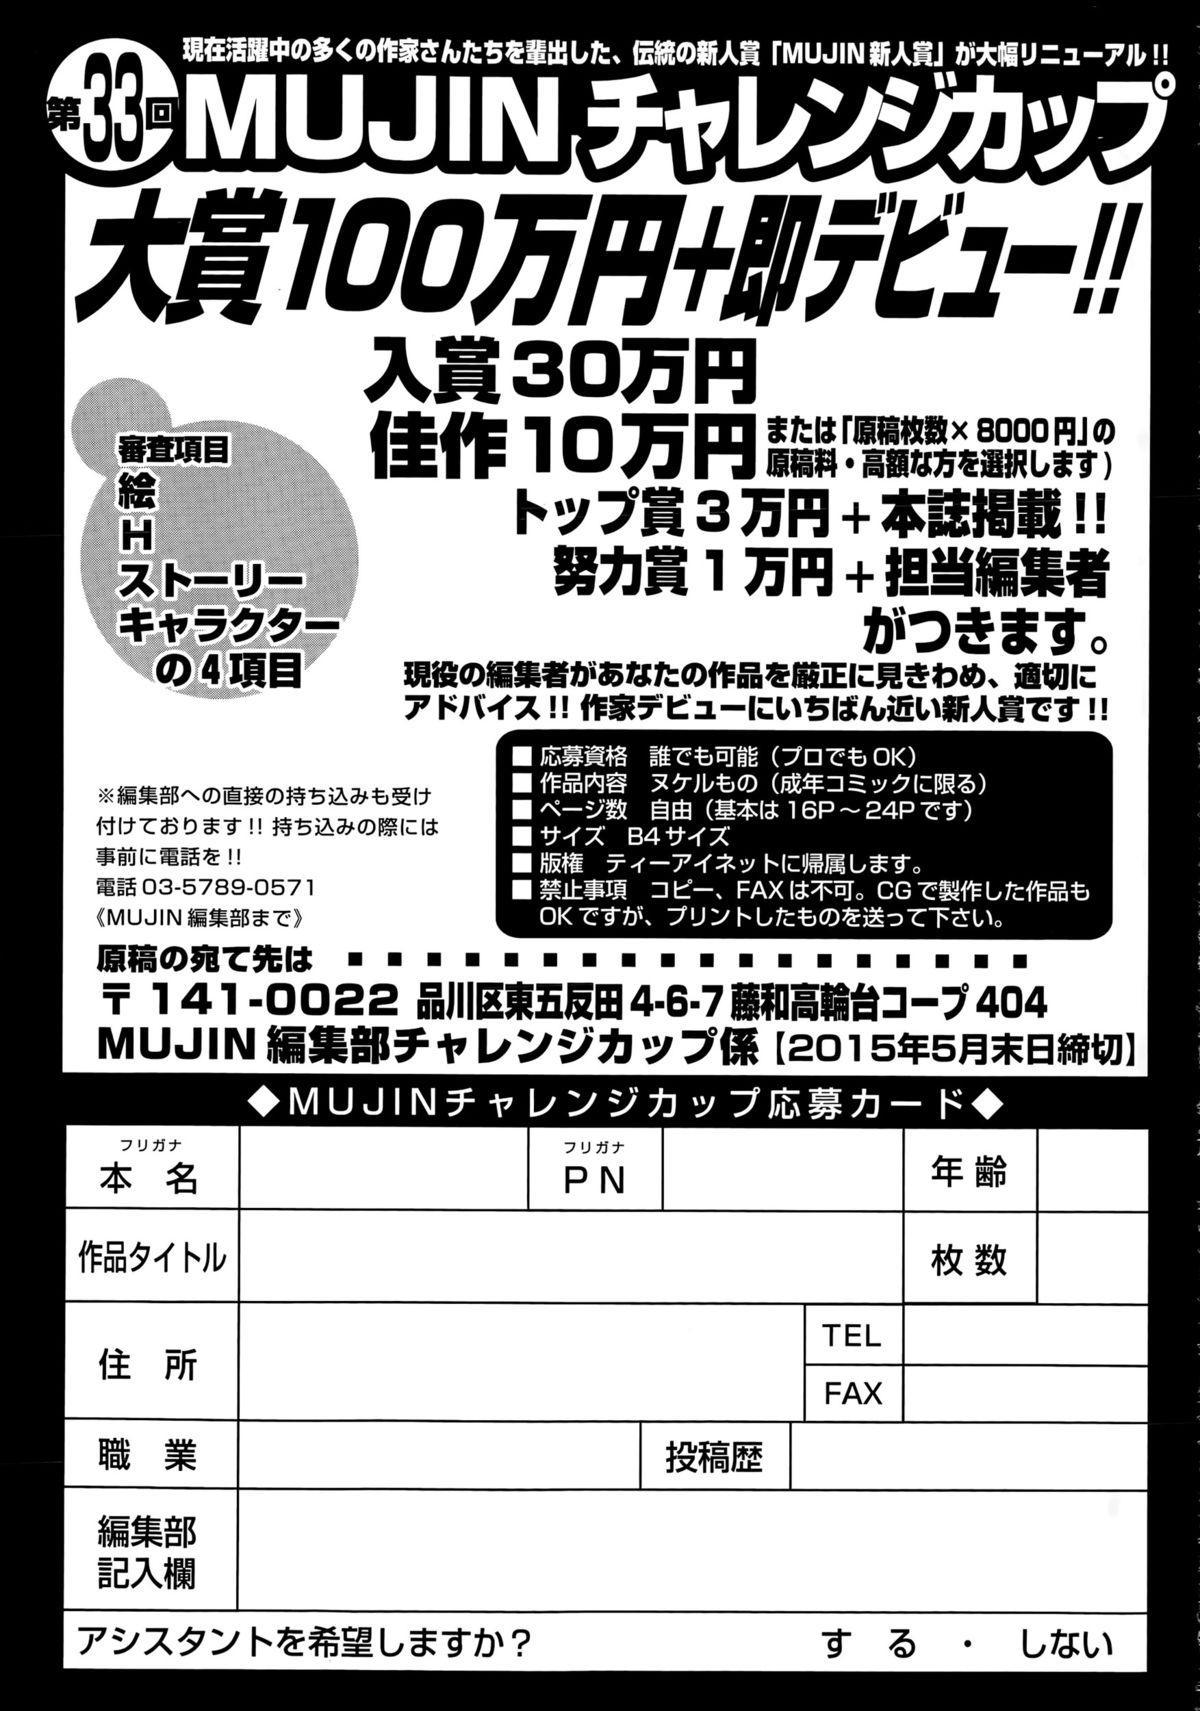 COMIC Mugen Tensei 2015-05 577